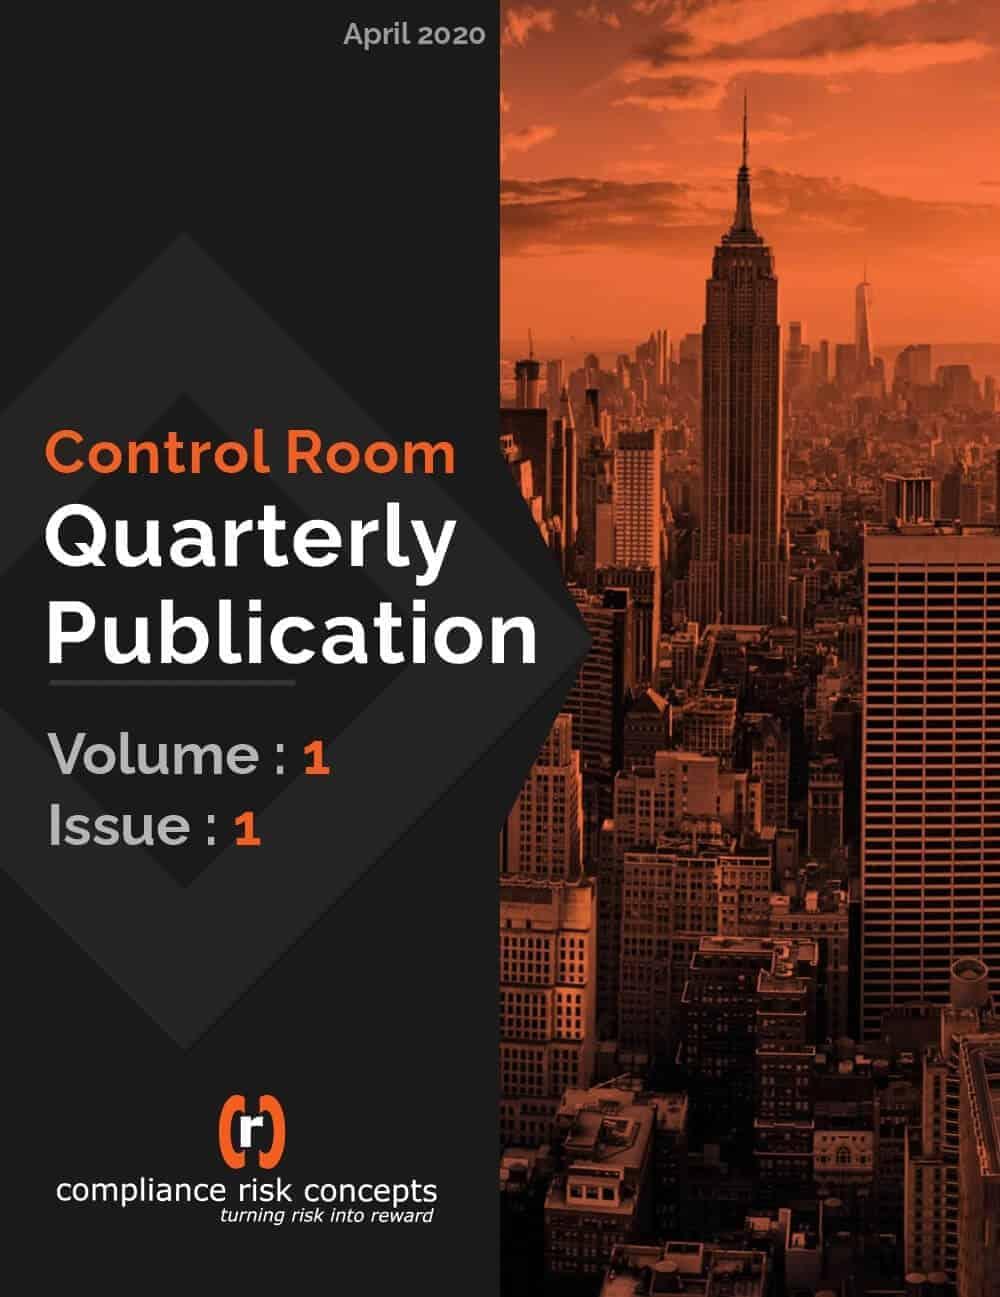 controlroom-publication-vol-1-issue-1 (1)